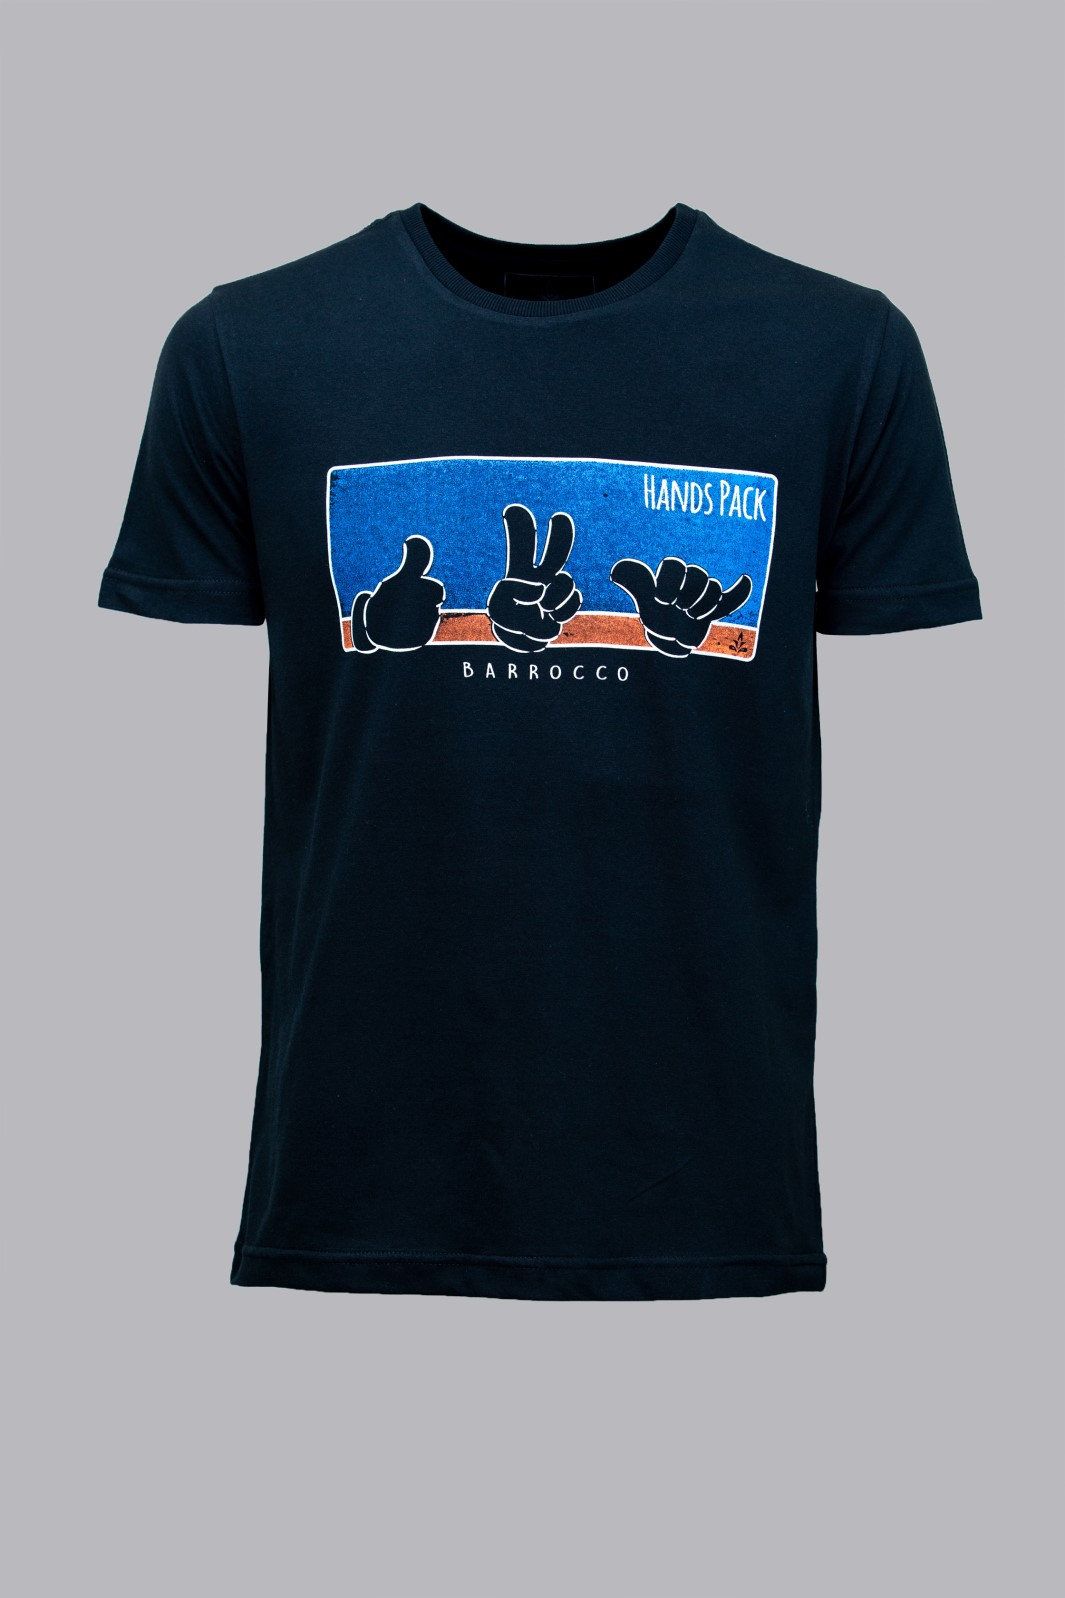 Camiseta Barrocco Hands Pack